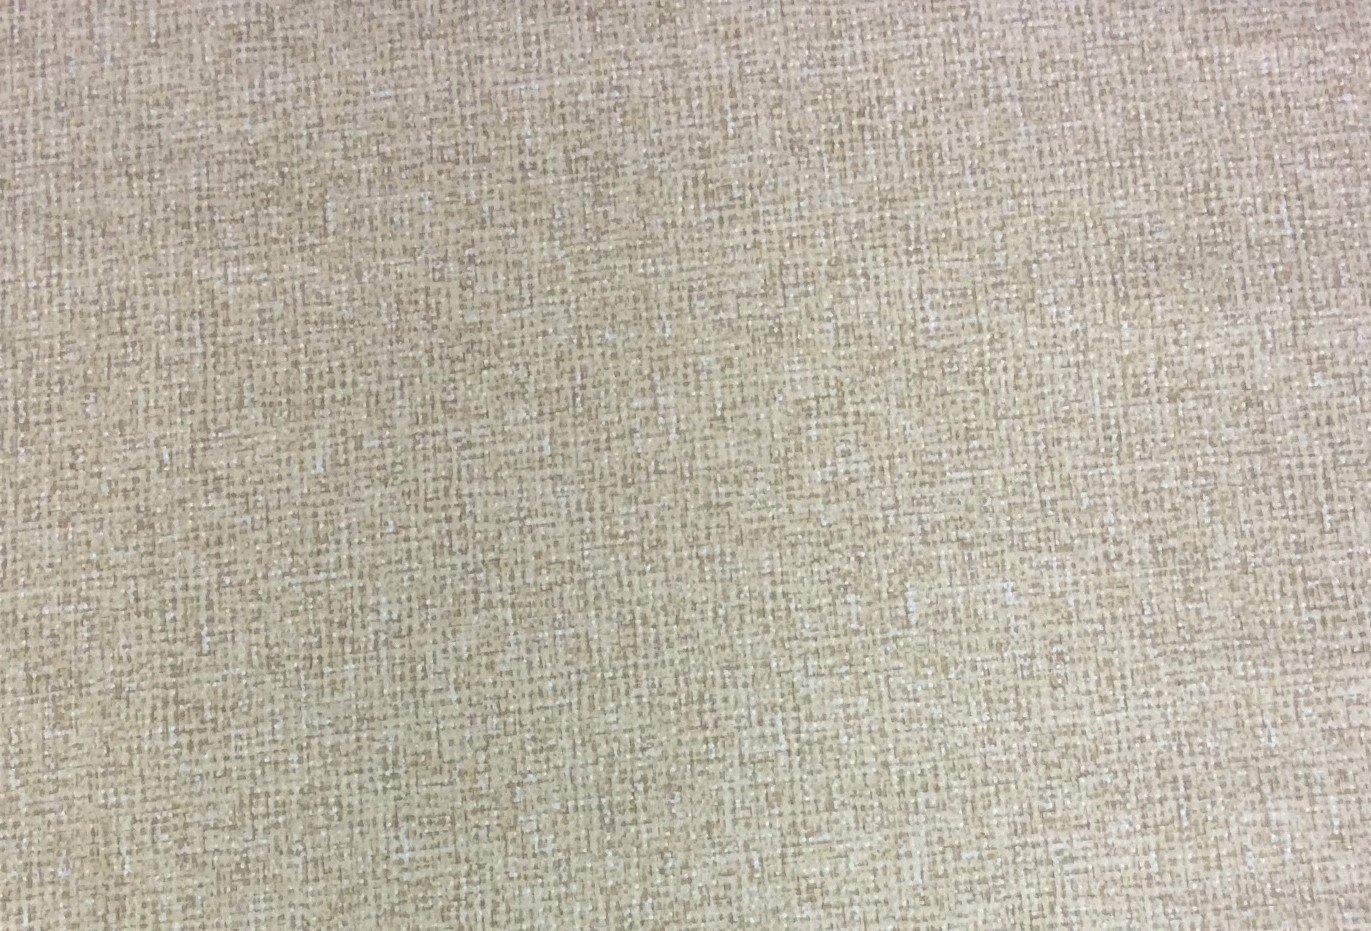 Metallic Crosshatch Gold Cream Check Blender Cotton Quilt Fabric MD207